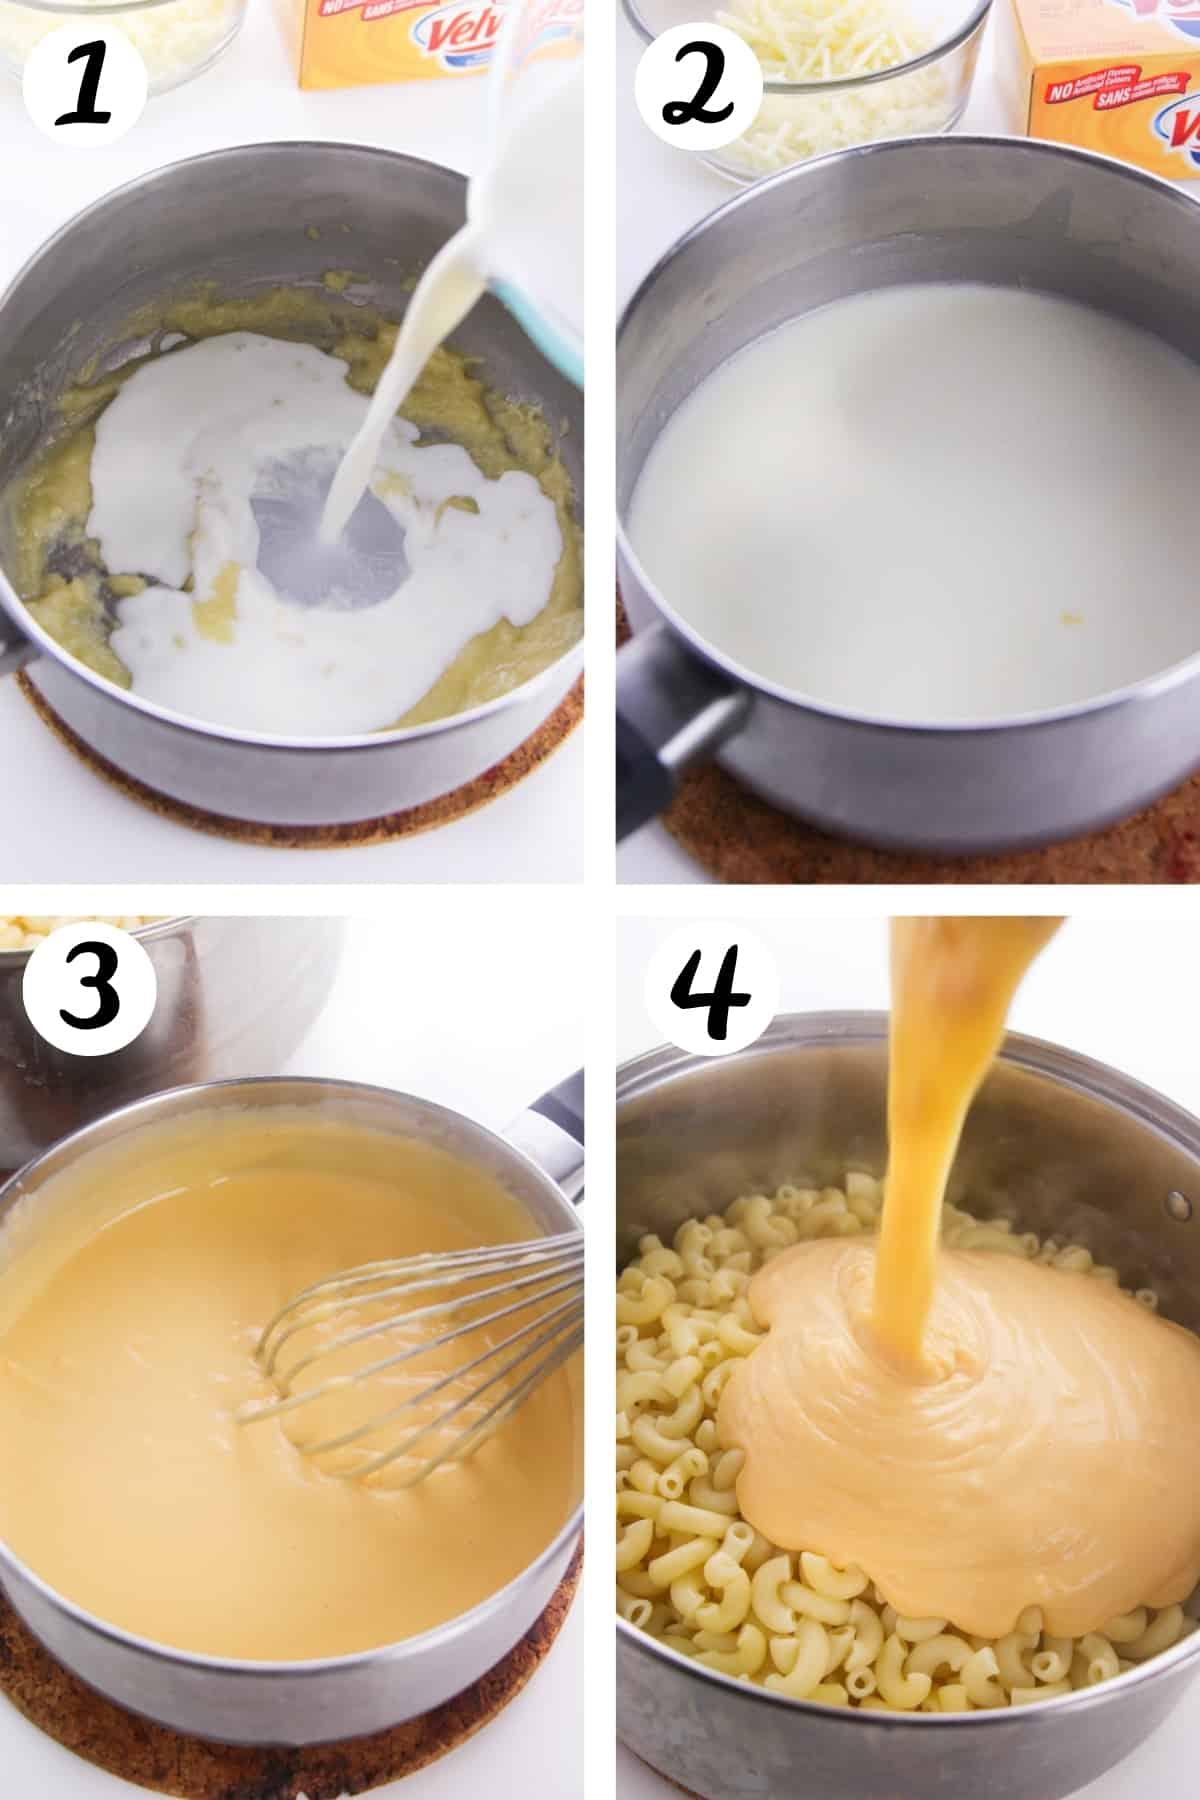 How to Make Macaroni and cheese on stovetop